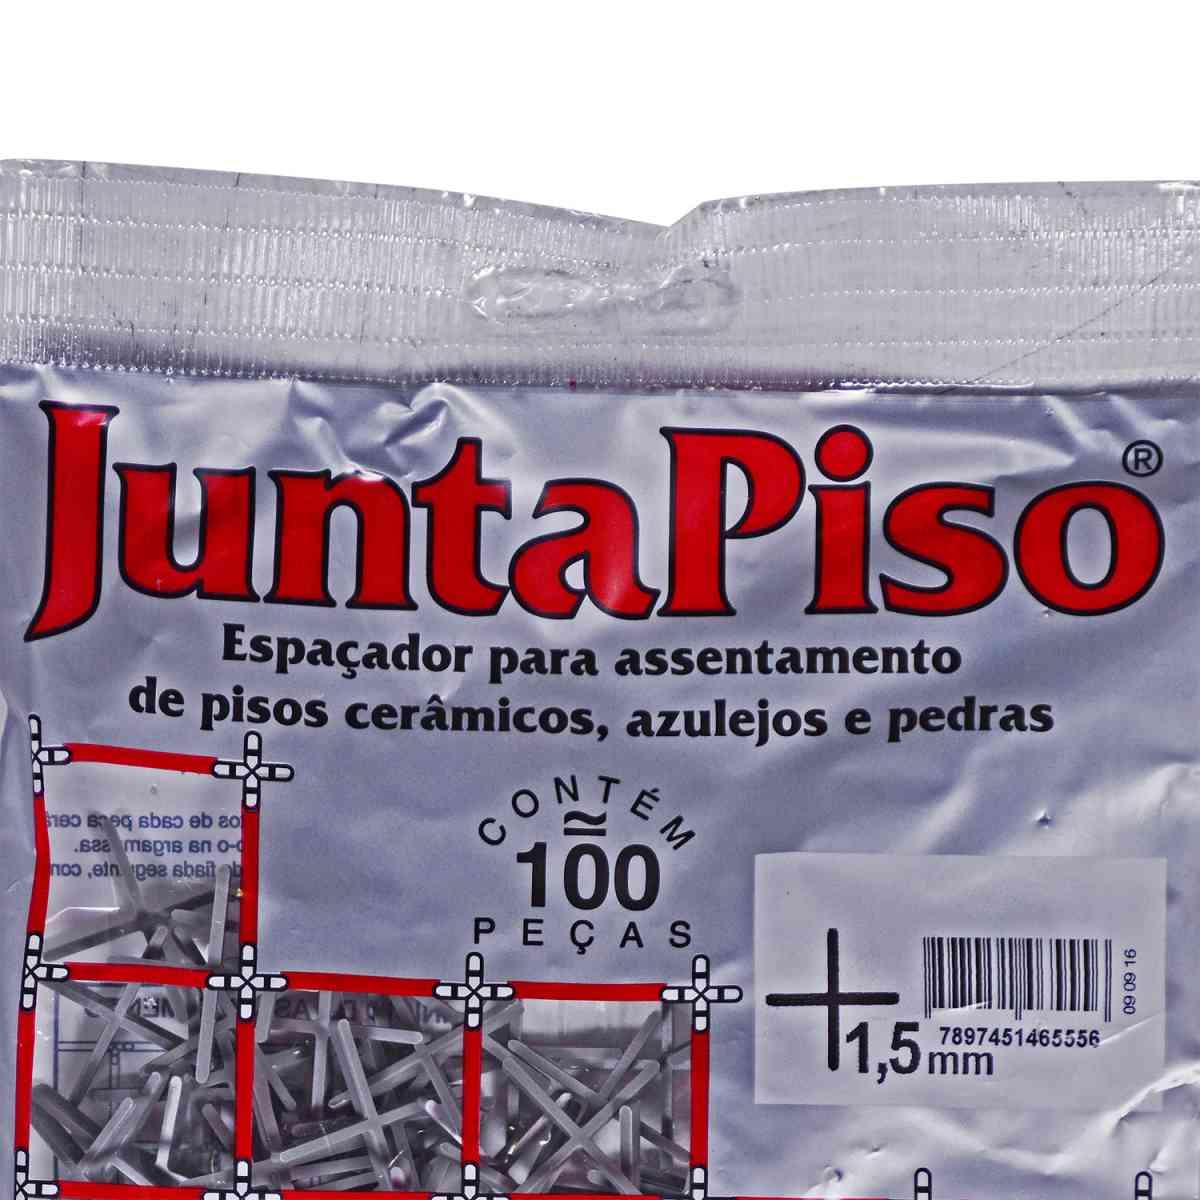 Espaçador de Junta de Piso 1,5 mm Cinza Cortag – 10 Pacotes